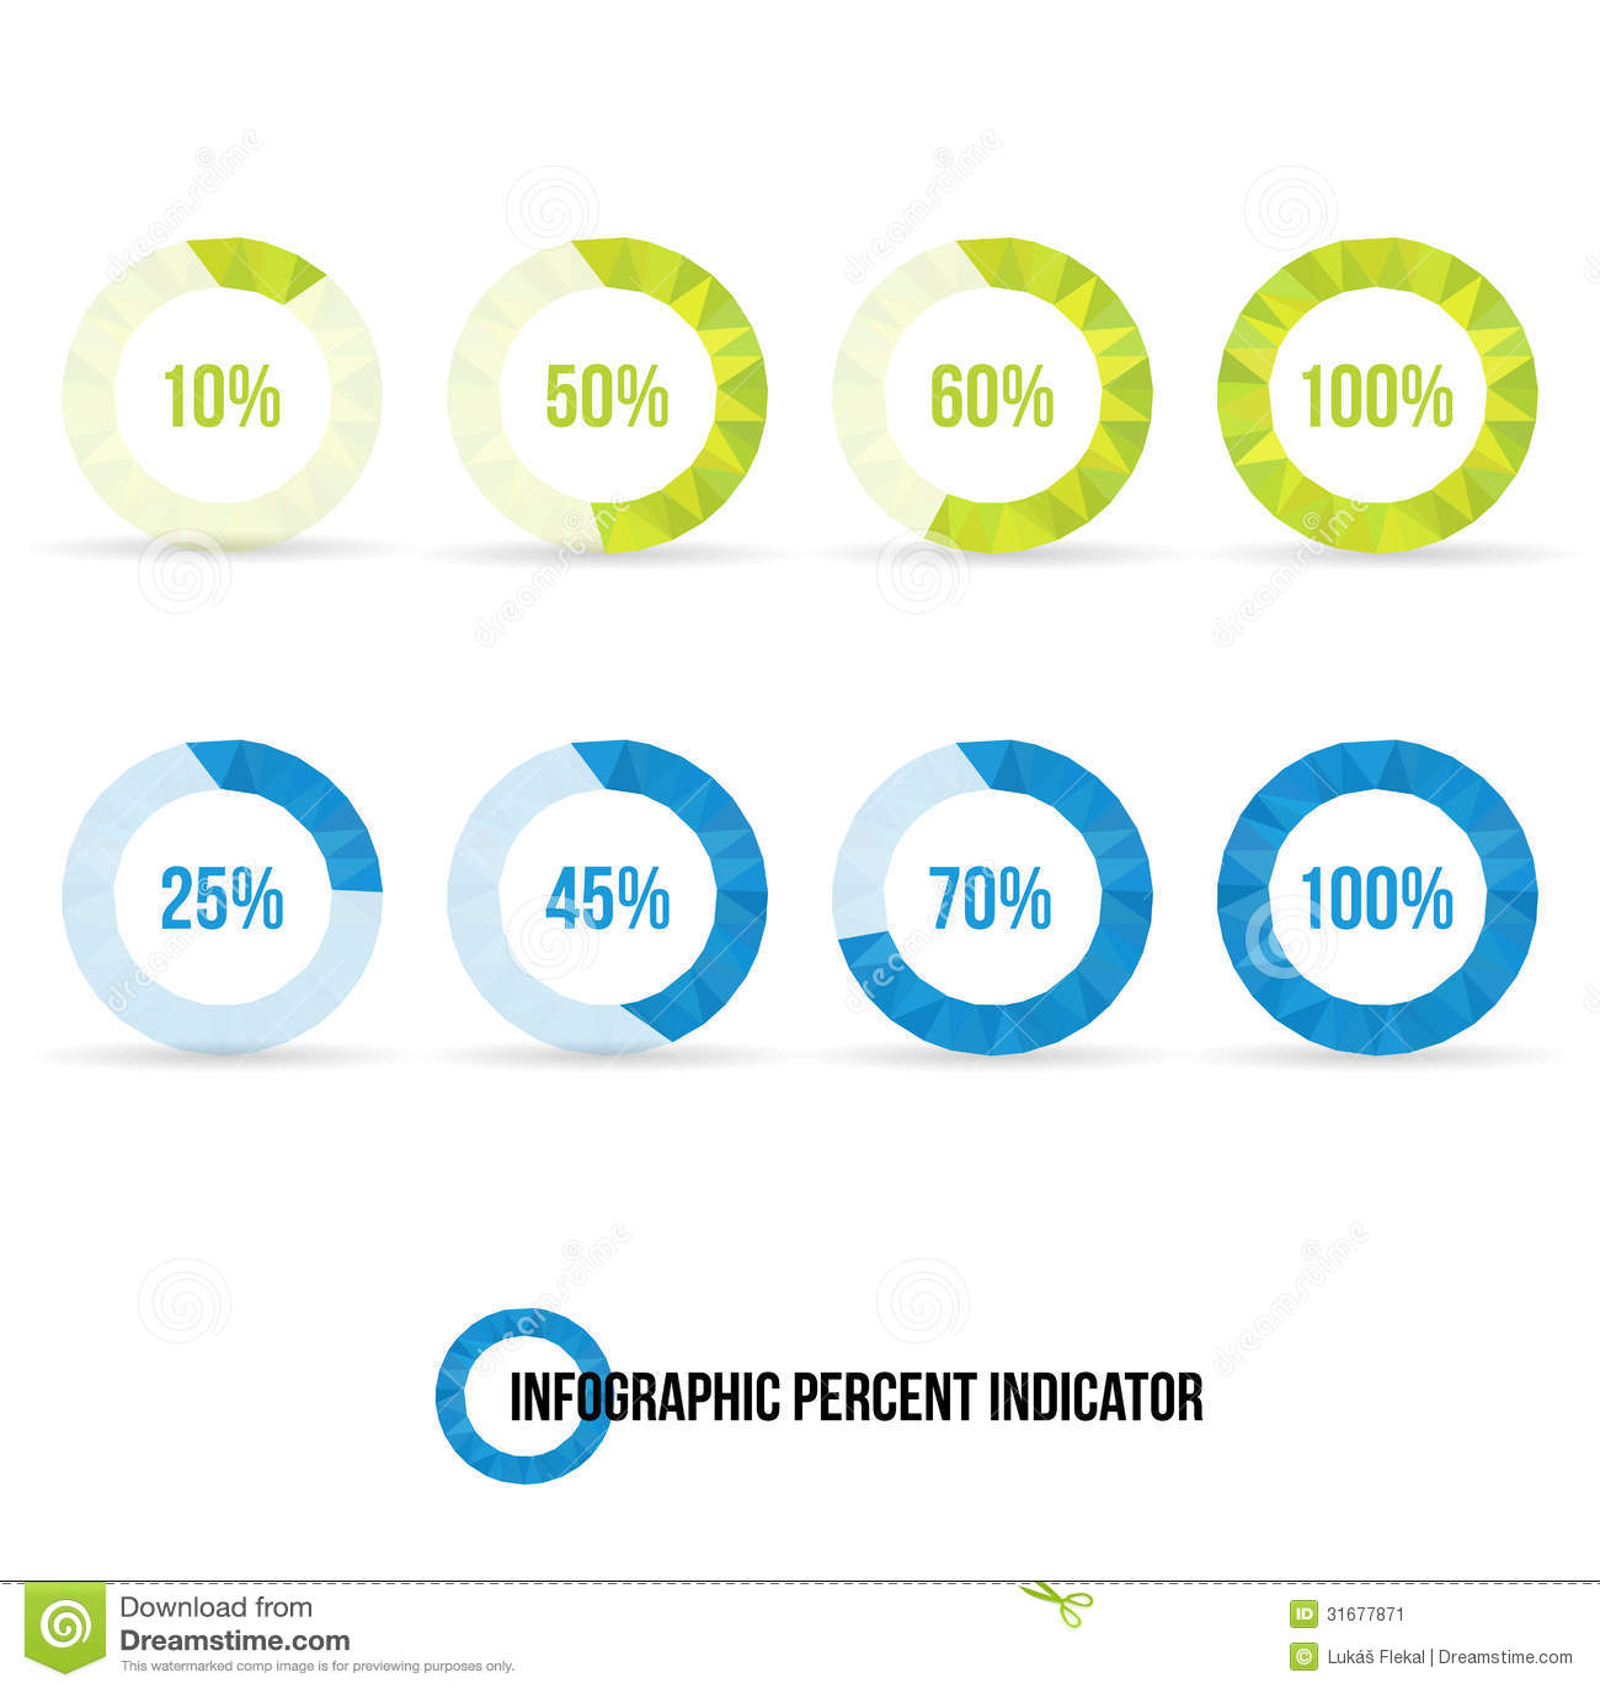 Percent Indicator Pie Chart Stock Illustration